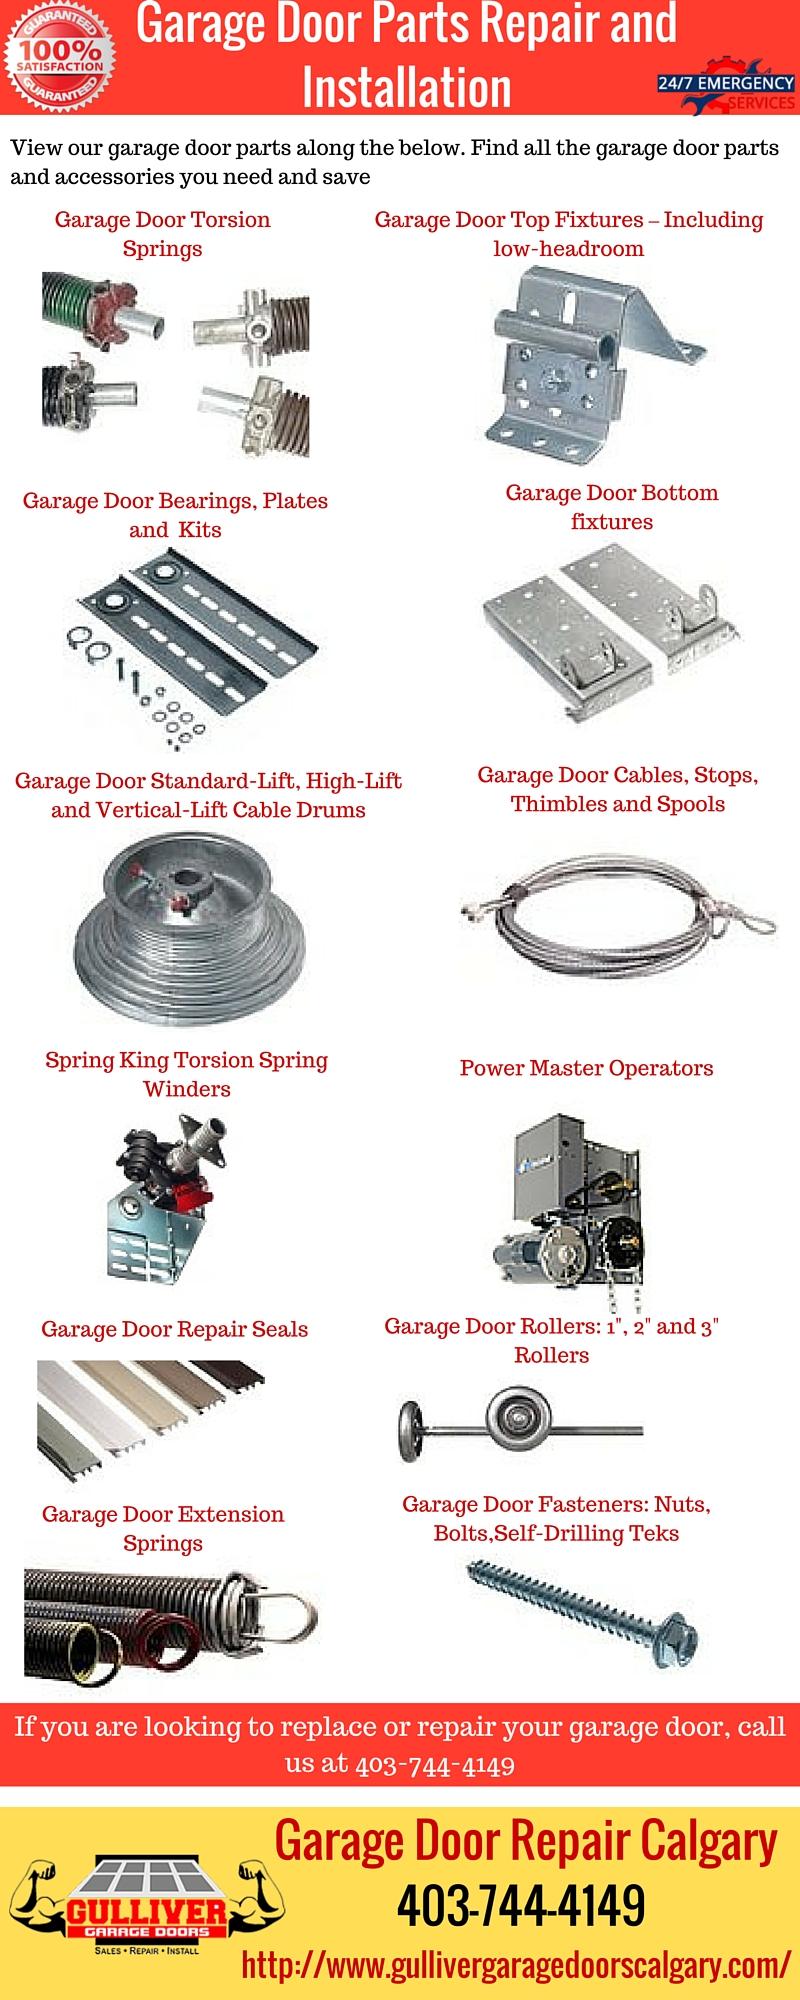 Parts Of A Door Installation : Garage door parts repair and installation gulliver